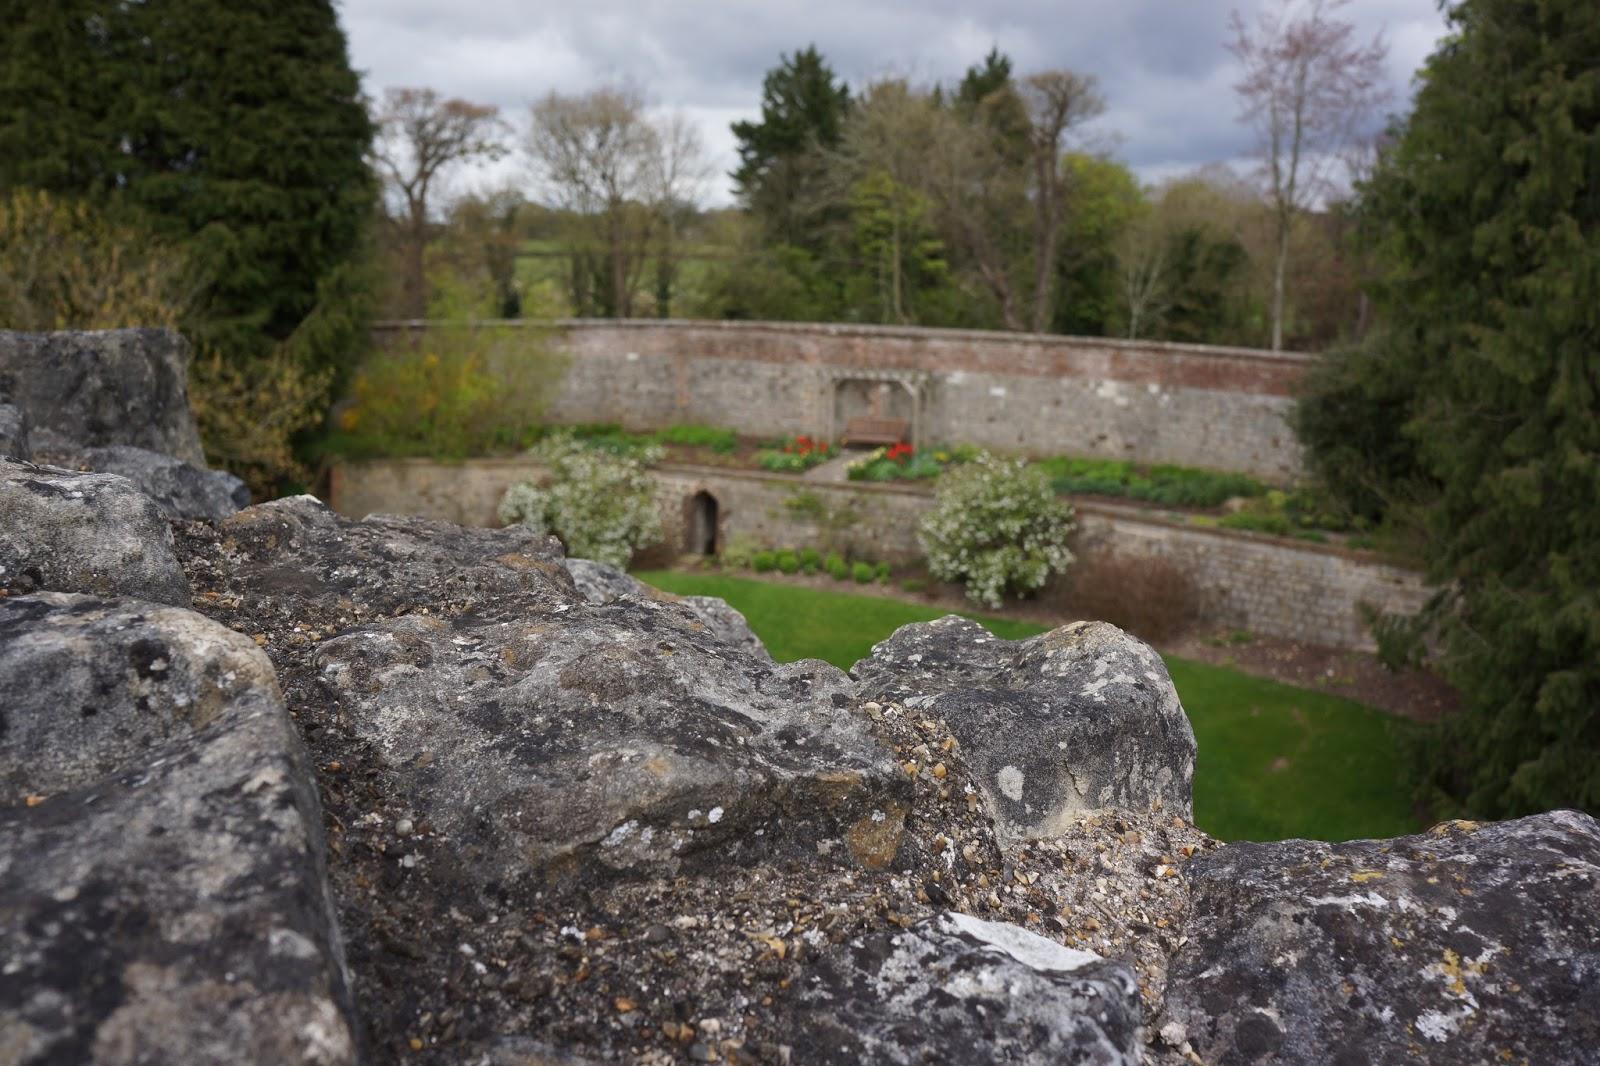 farnham castle surrey view of garden from castle